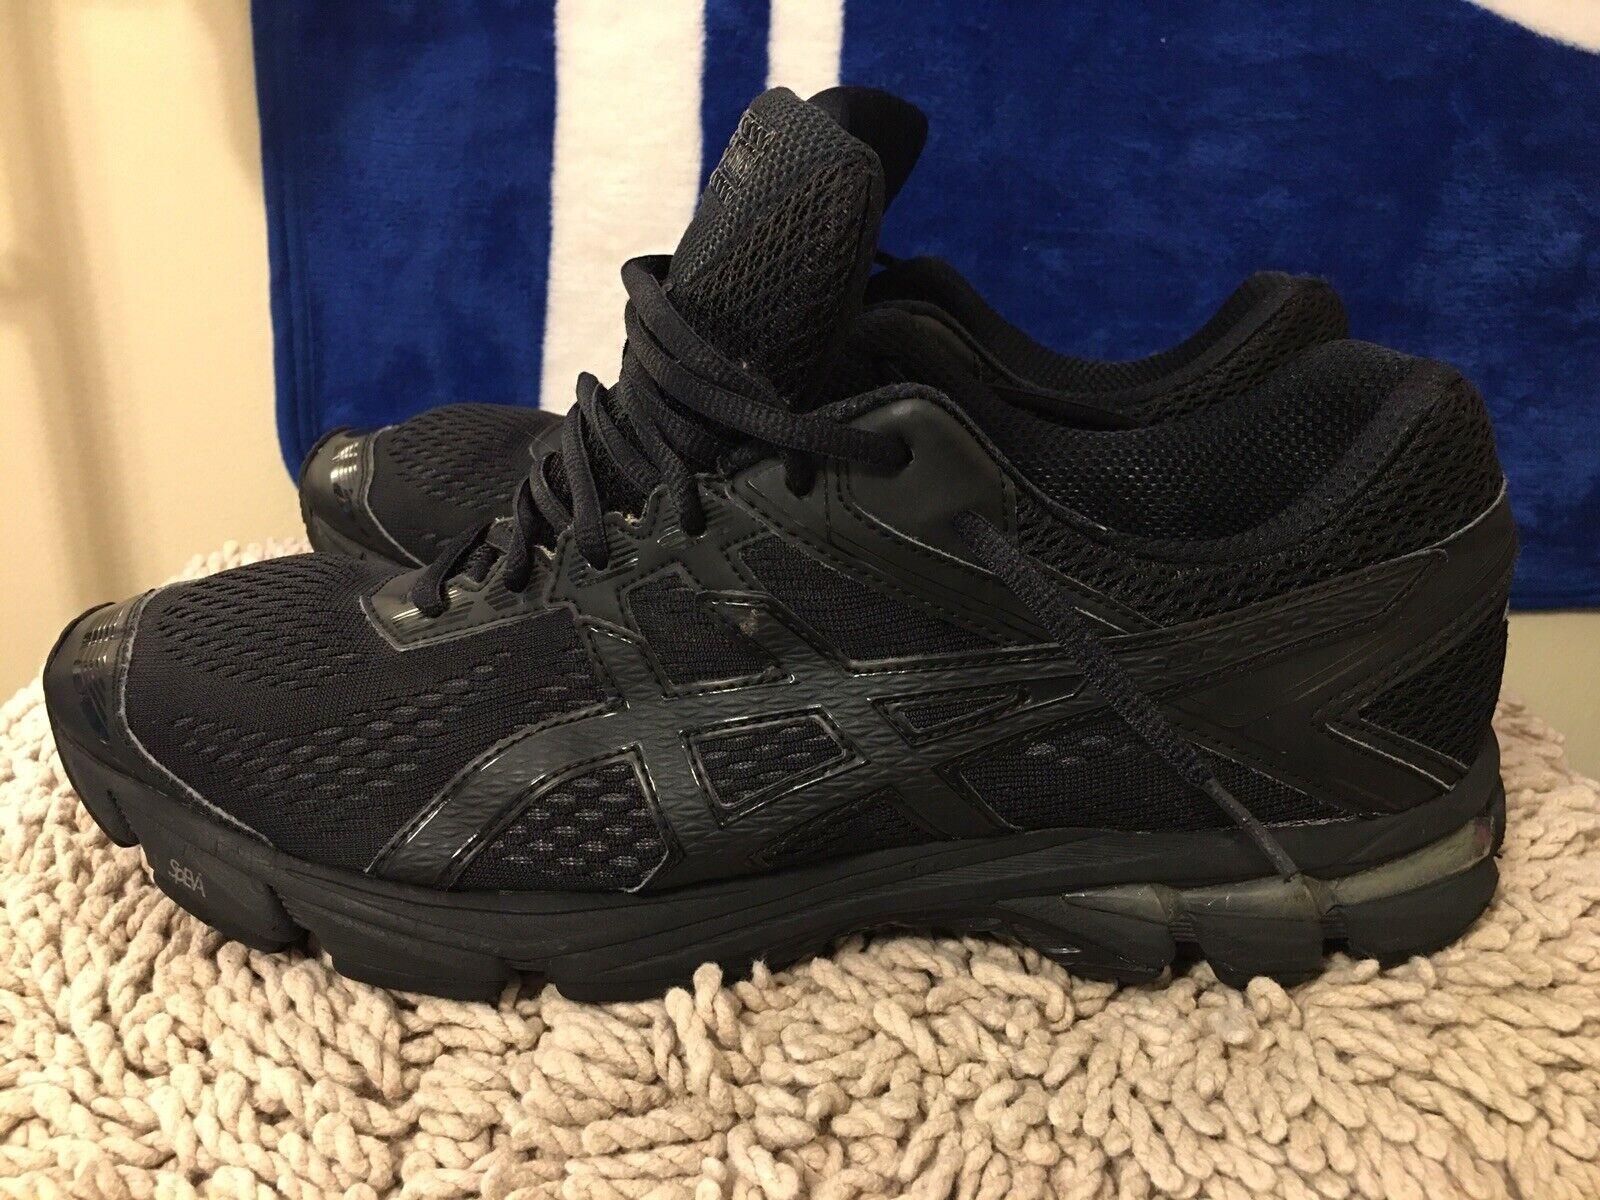 ASICS GEL Evate 2 Running Shoes Mens 8